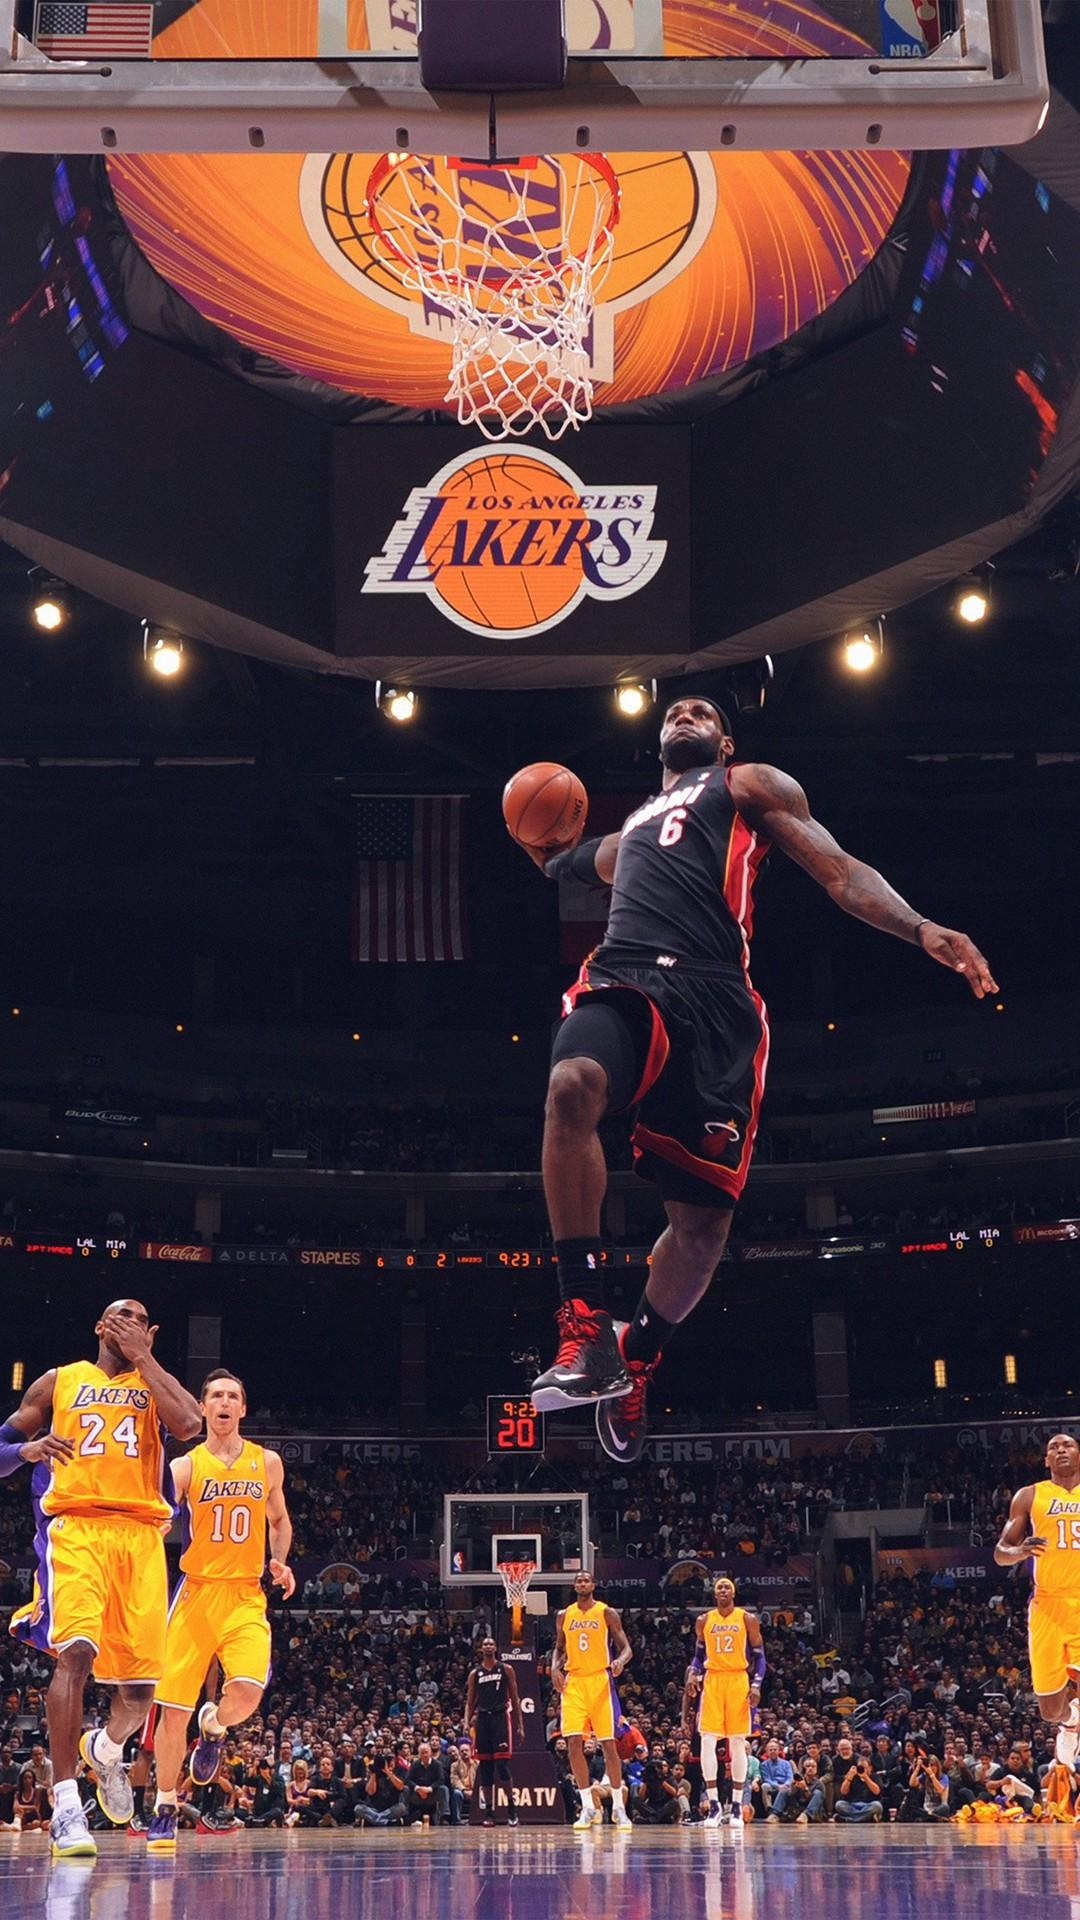 Lebron James NBA Basketball Dunk iPhone 6 wallpaper